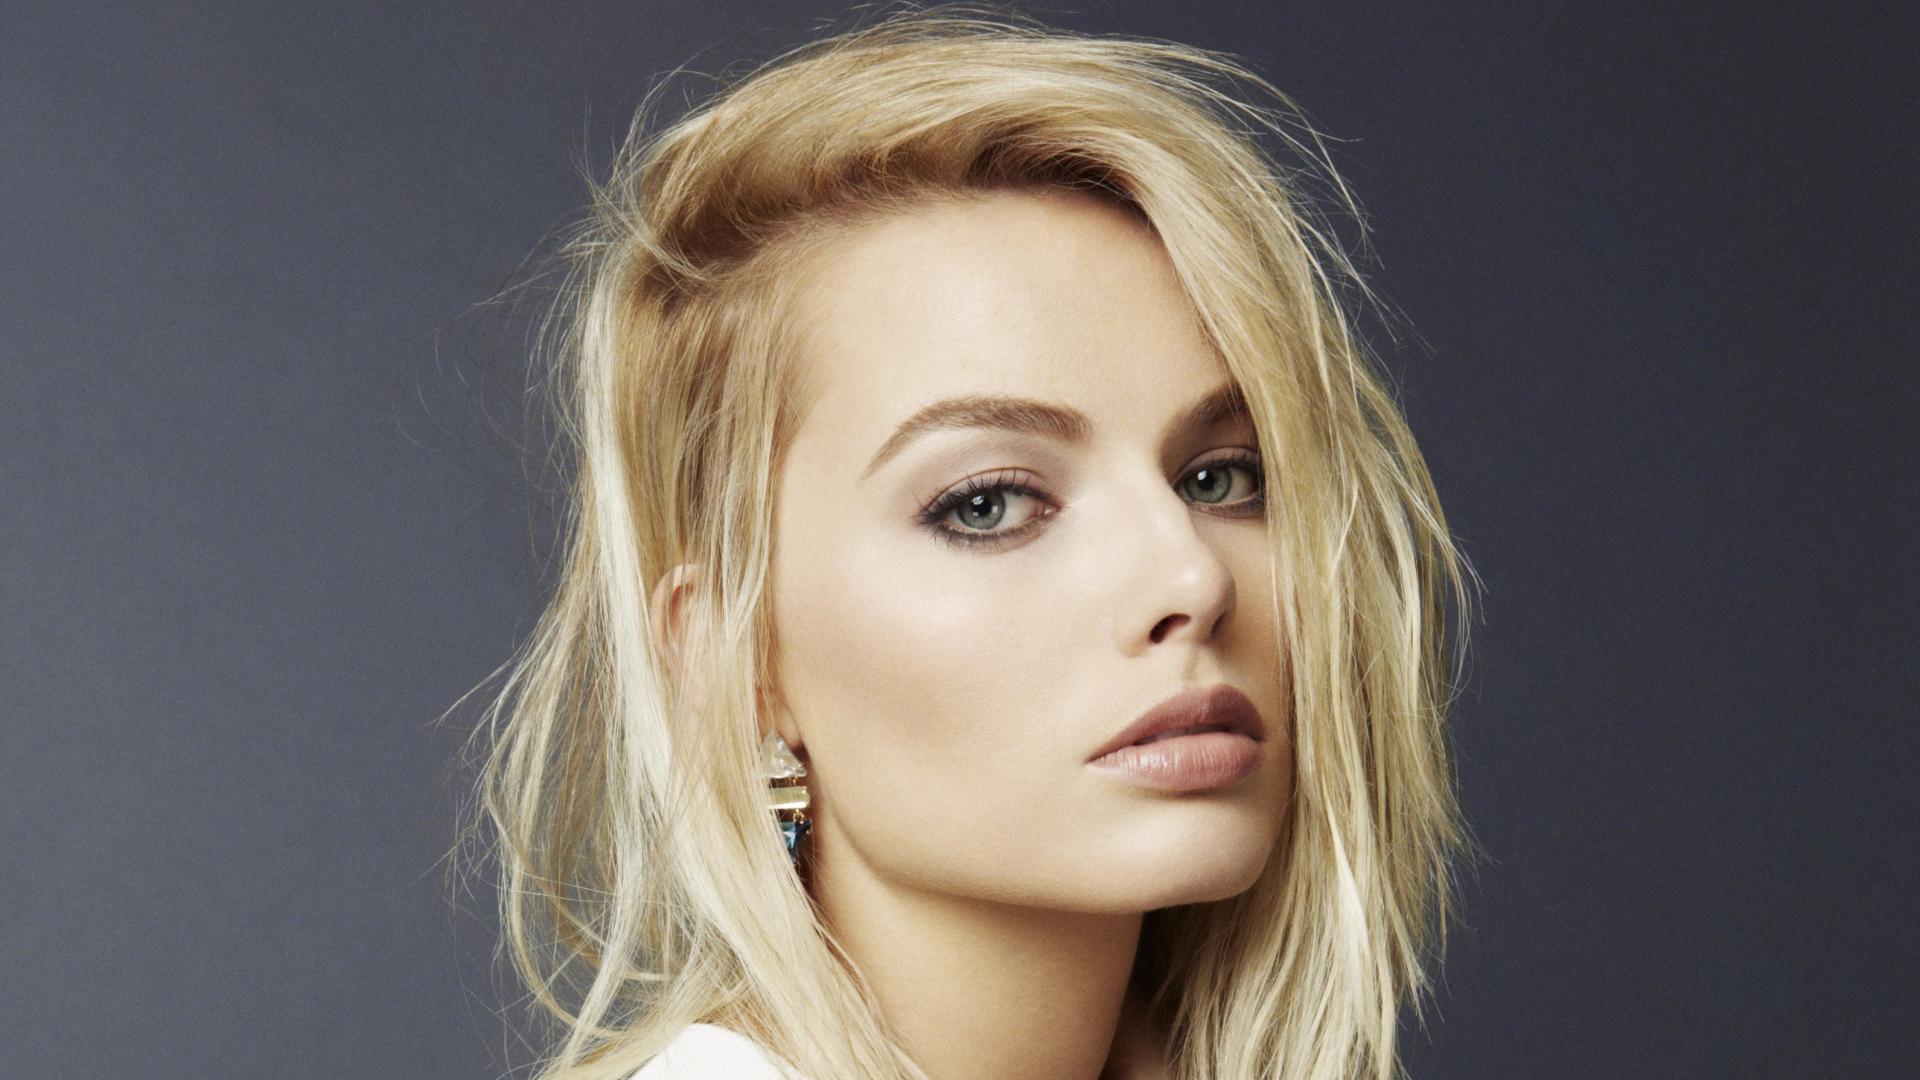 Free Download Margot Robbie 2019 4k Hd Celebrities 4k